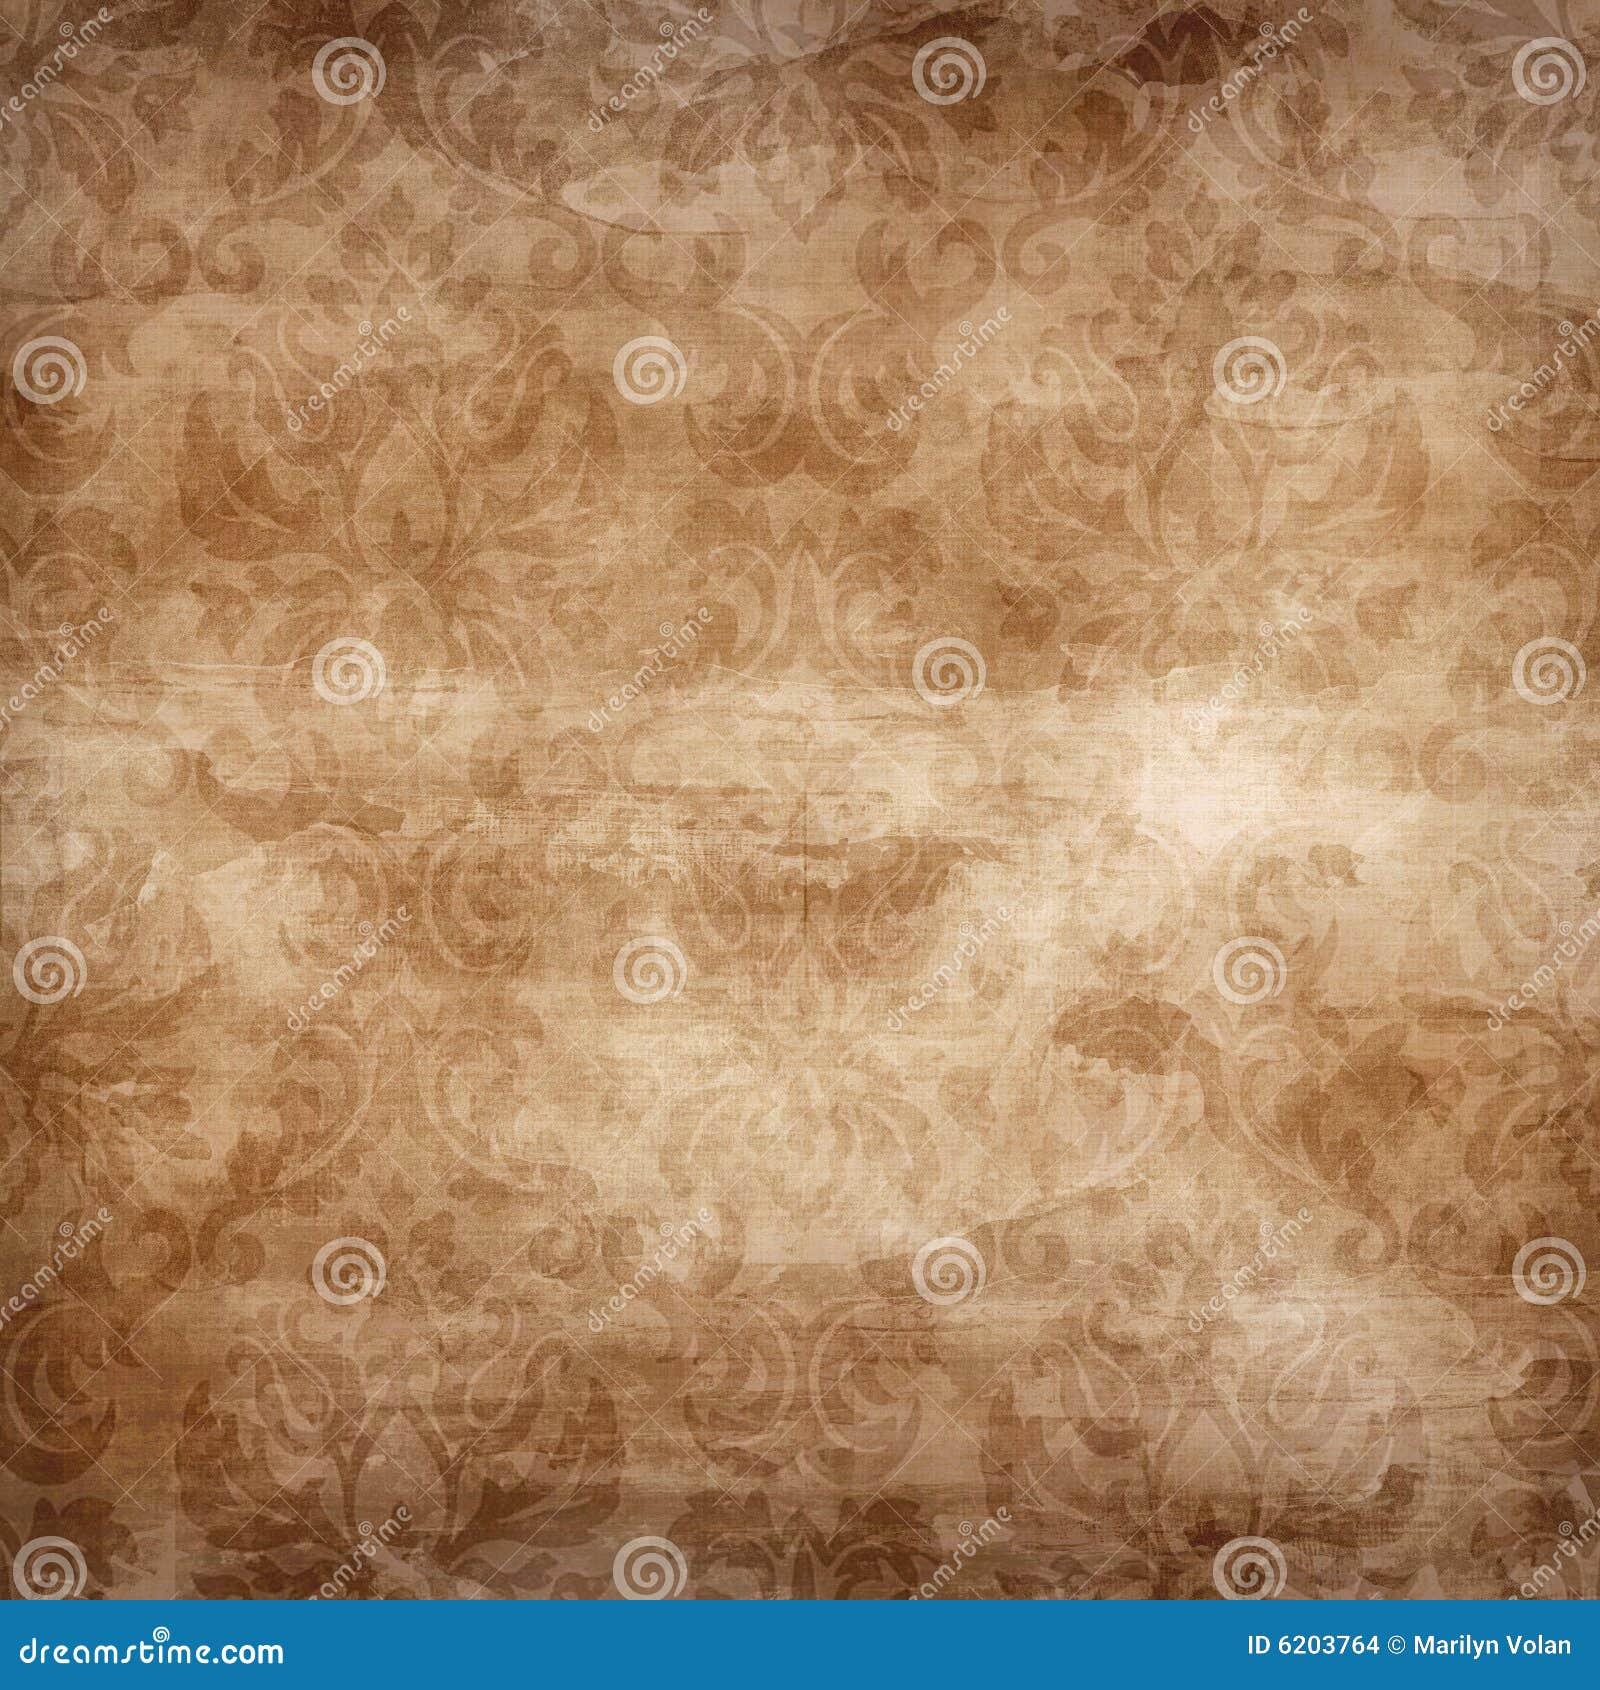 Scrapbook paper as wallpaper - Light Brown Damask Seamless Stock Images Image 6203764